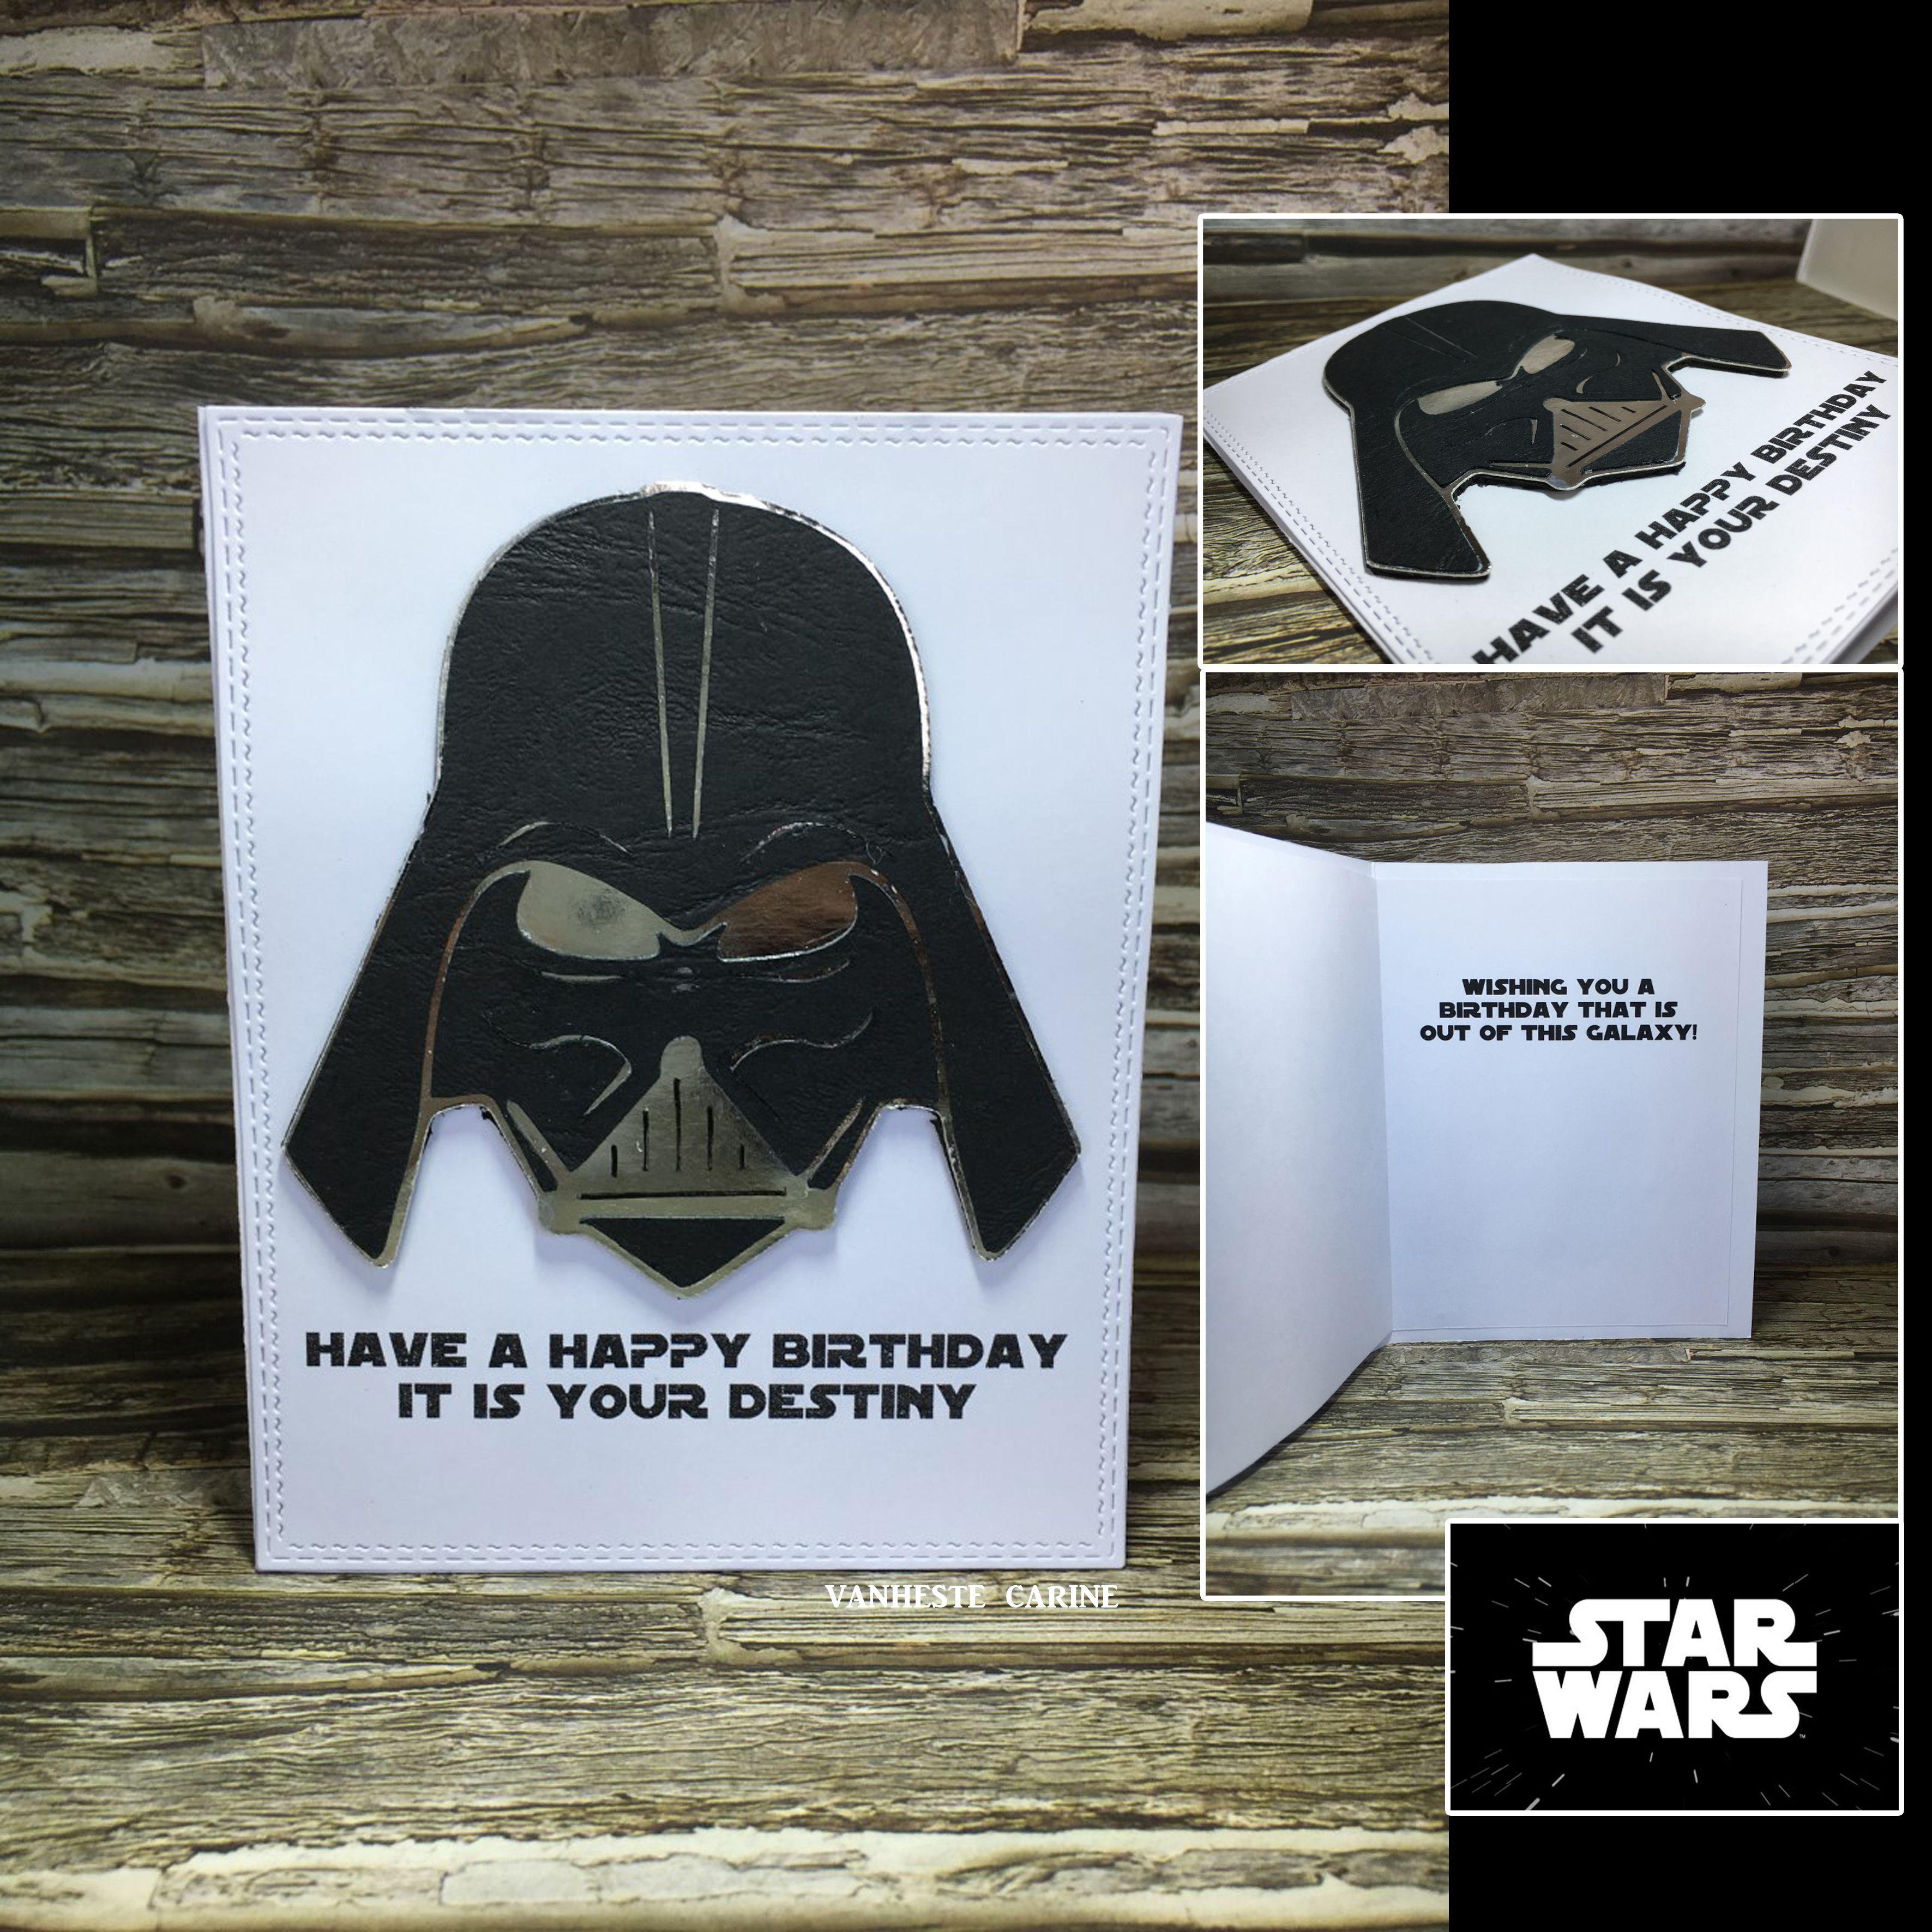 Star Wars Darth Vader Birthday Card Vanheste Carine Starwars Birthday Card Birthday Cards Star Wars Birthday